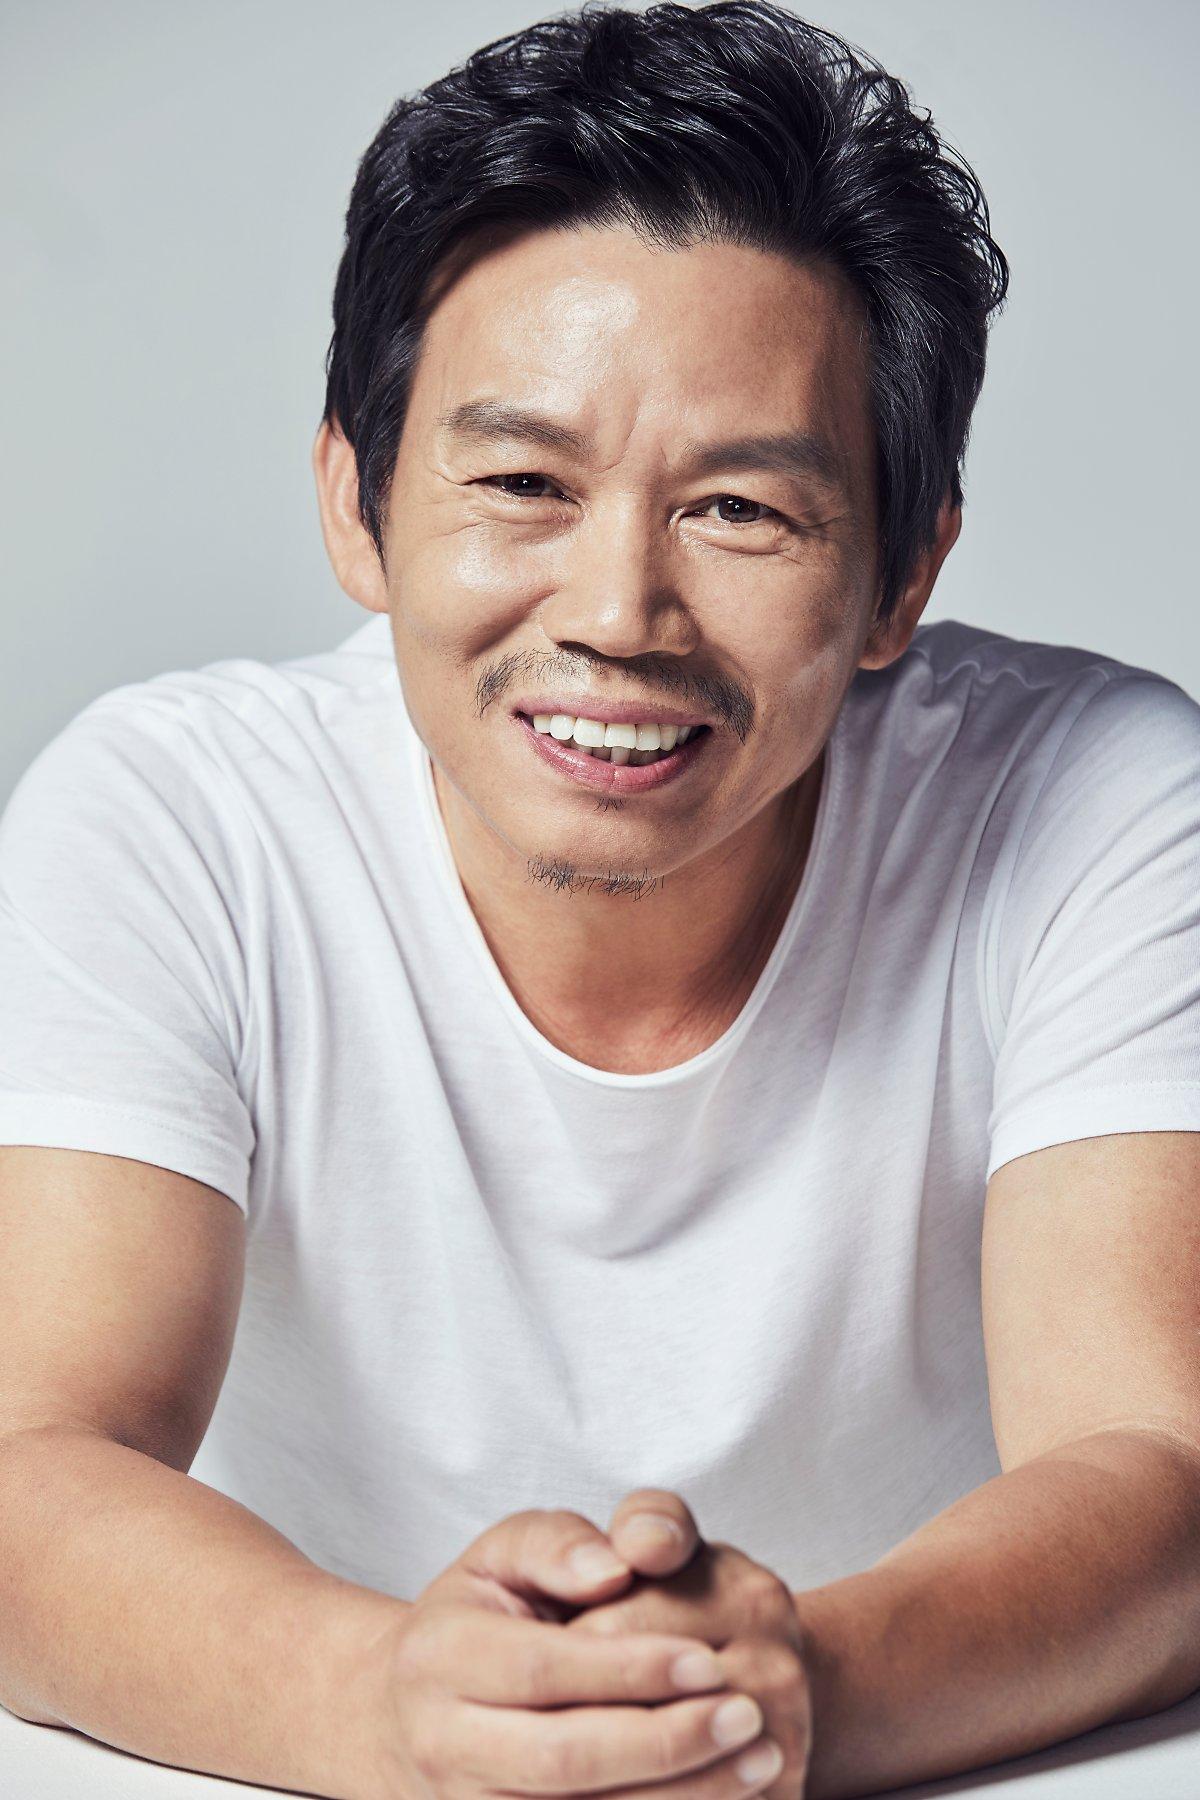 Baek Seung Chul